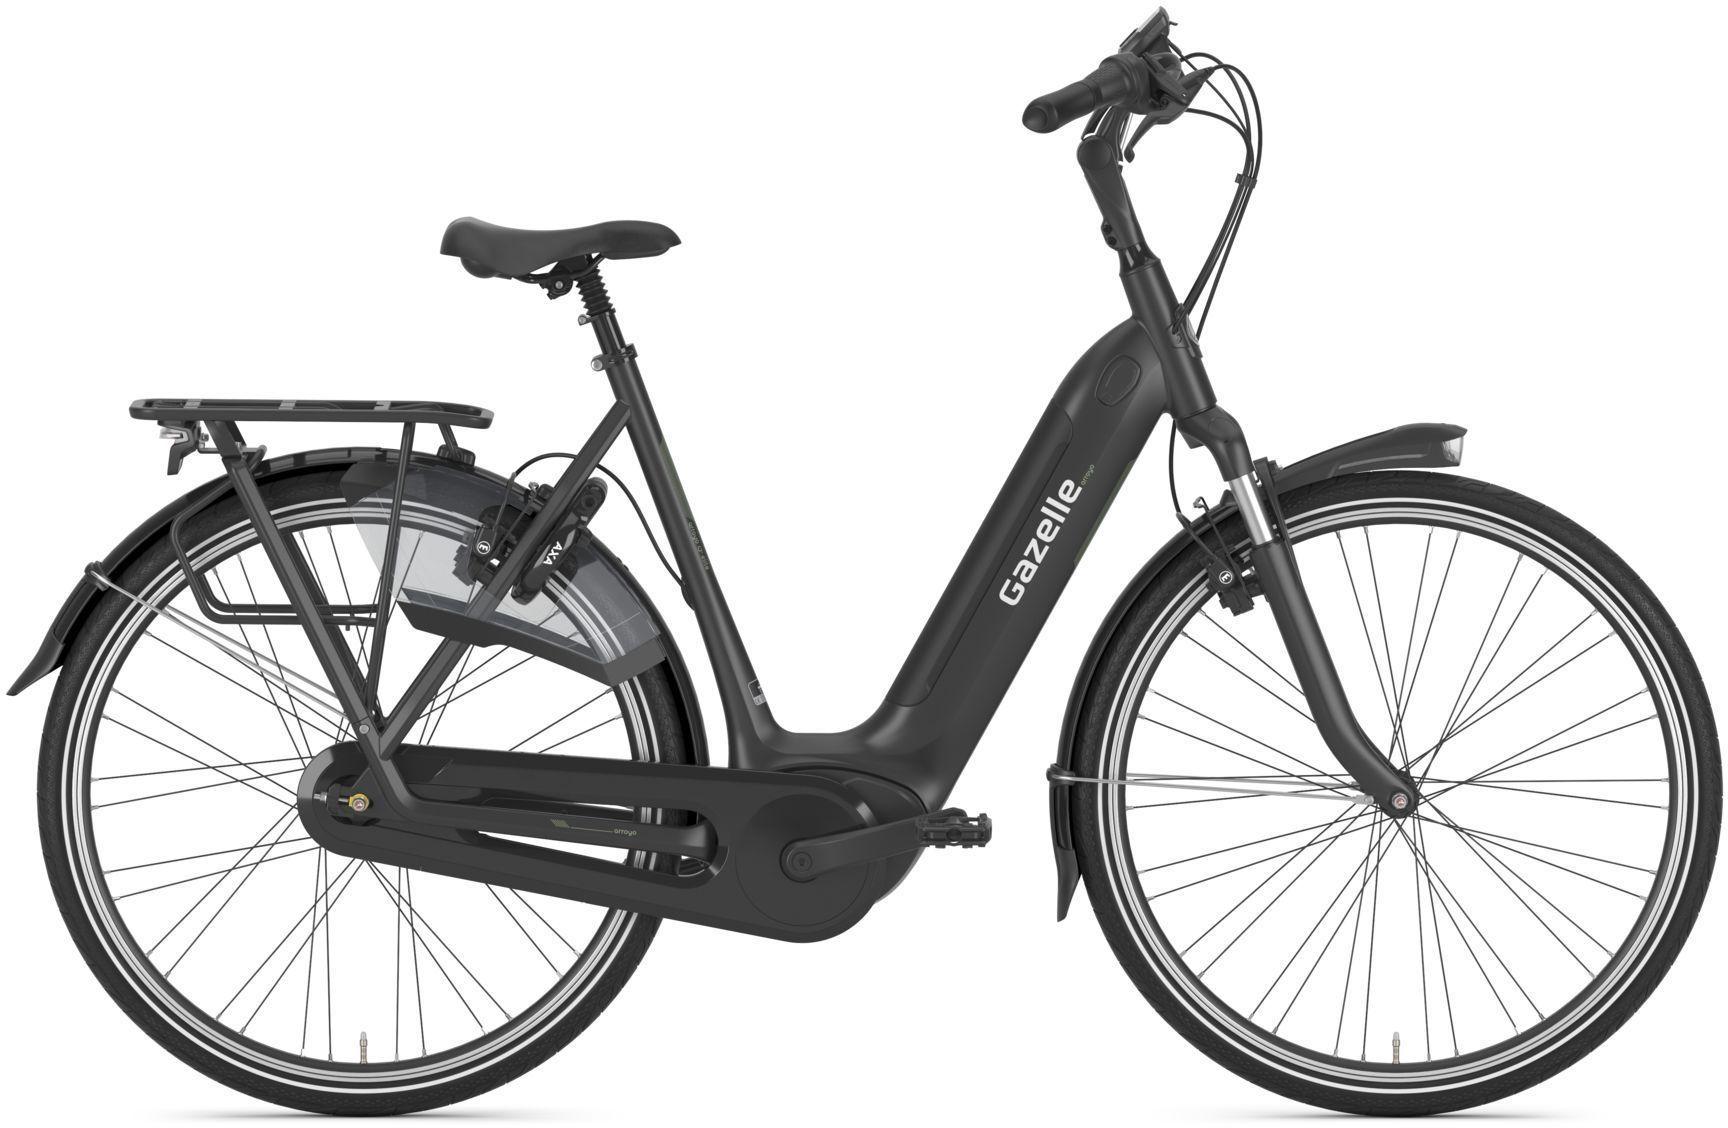 E-Bikes: Gazelle  ARROYO C7+ HMB ELITE SPEZIAL (500 Wh) 7 Gang Nabenschaltung Damenfahrrad Tiefeinsteiger Modell 2021 28 Zoll 57 cm b